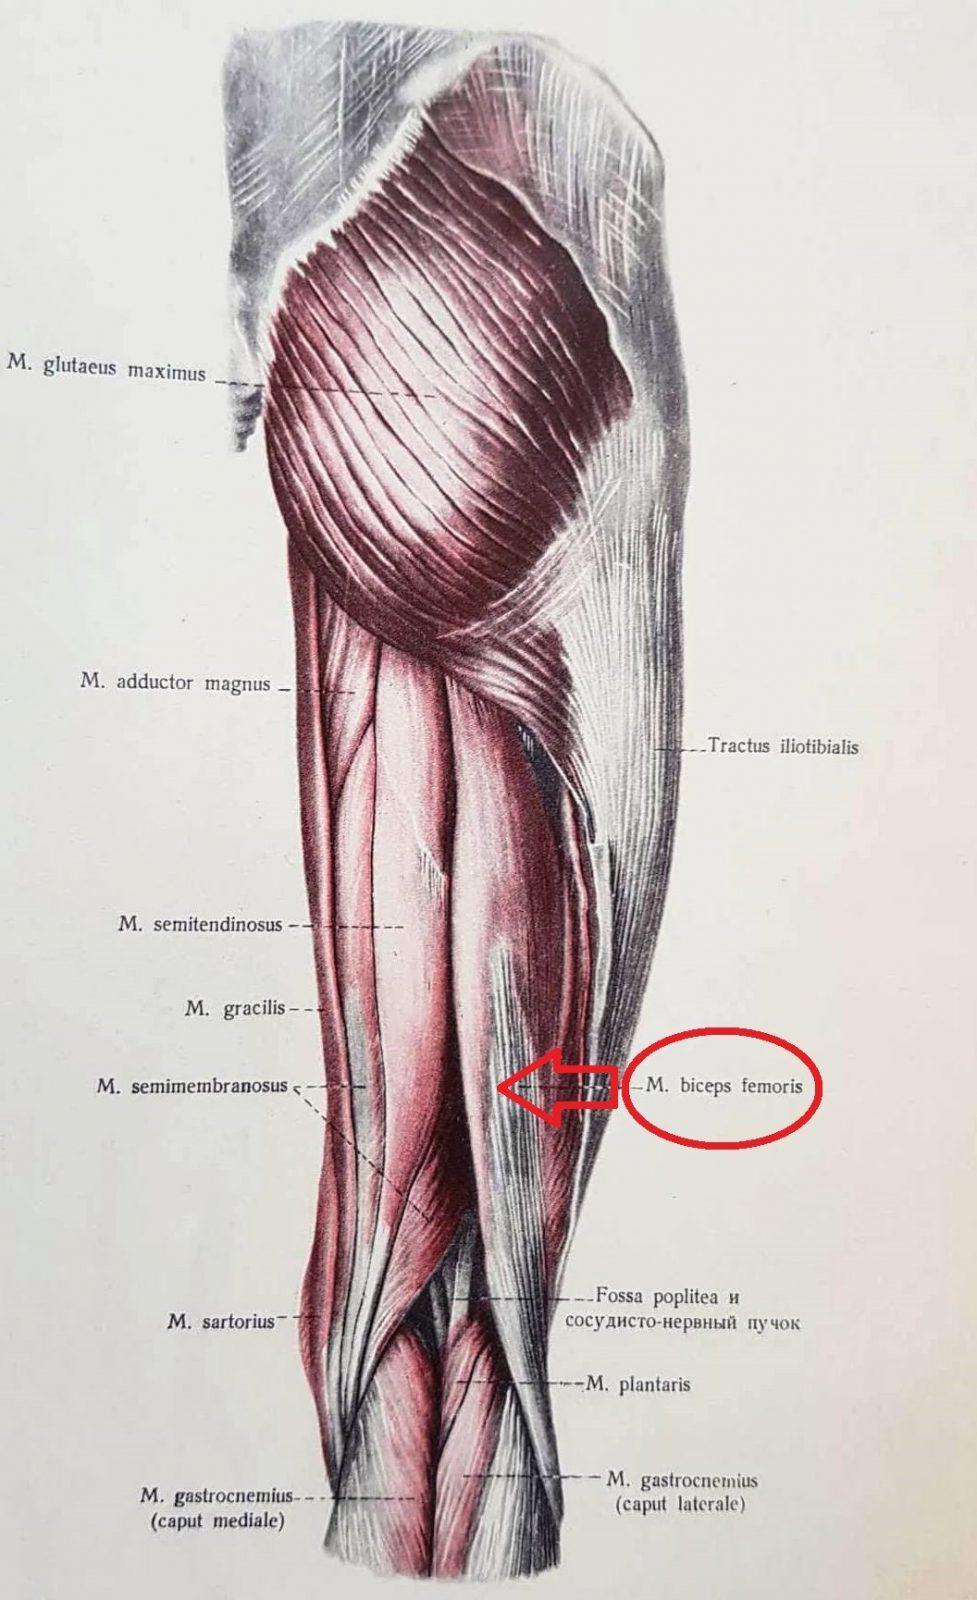 dvojhlavy sval stehna